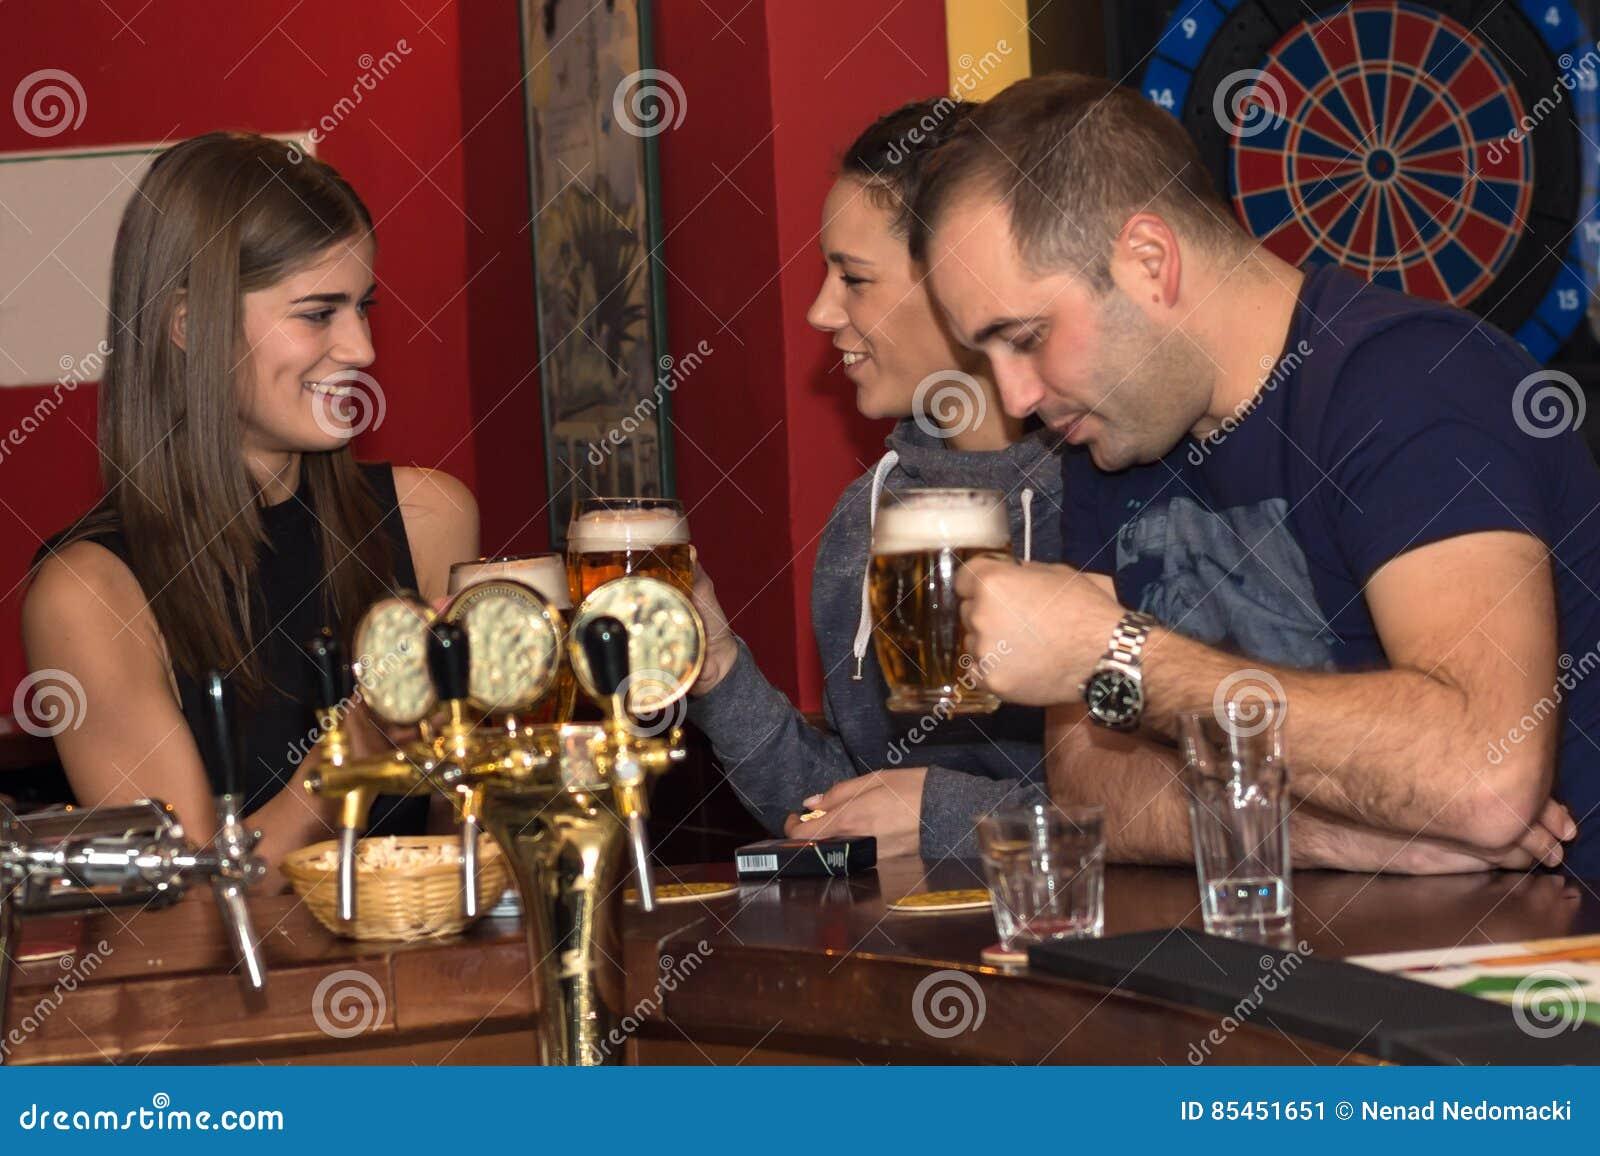 Amici che hanno bevande in una barra